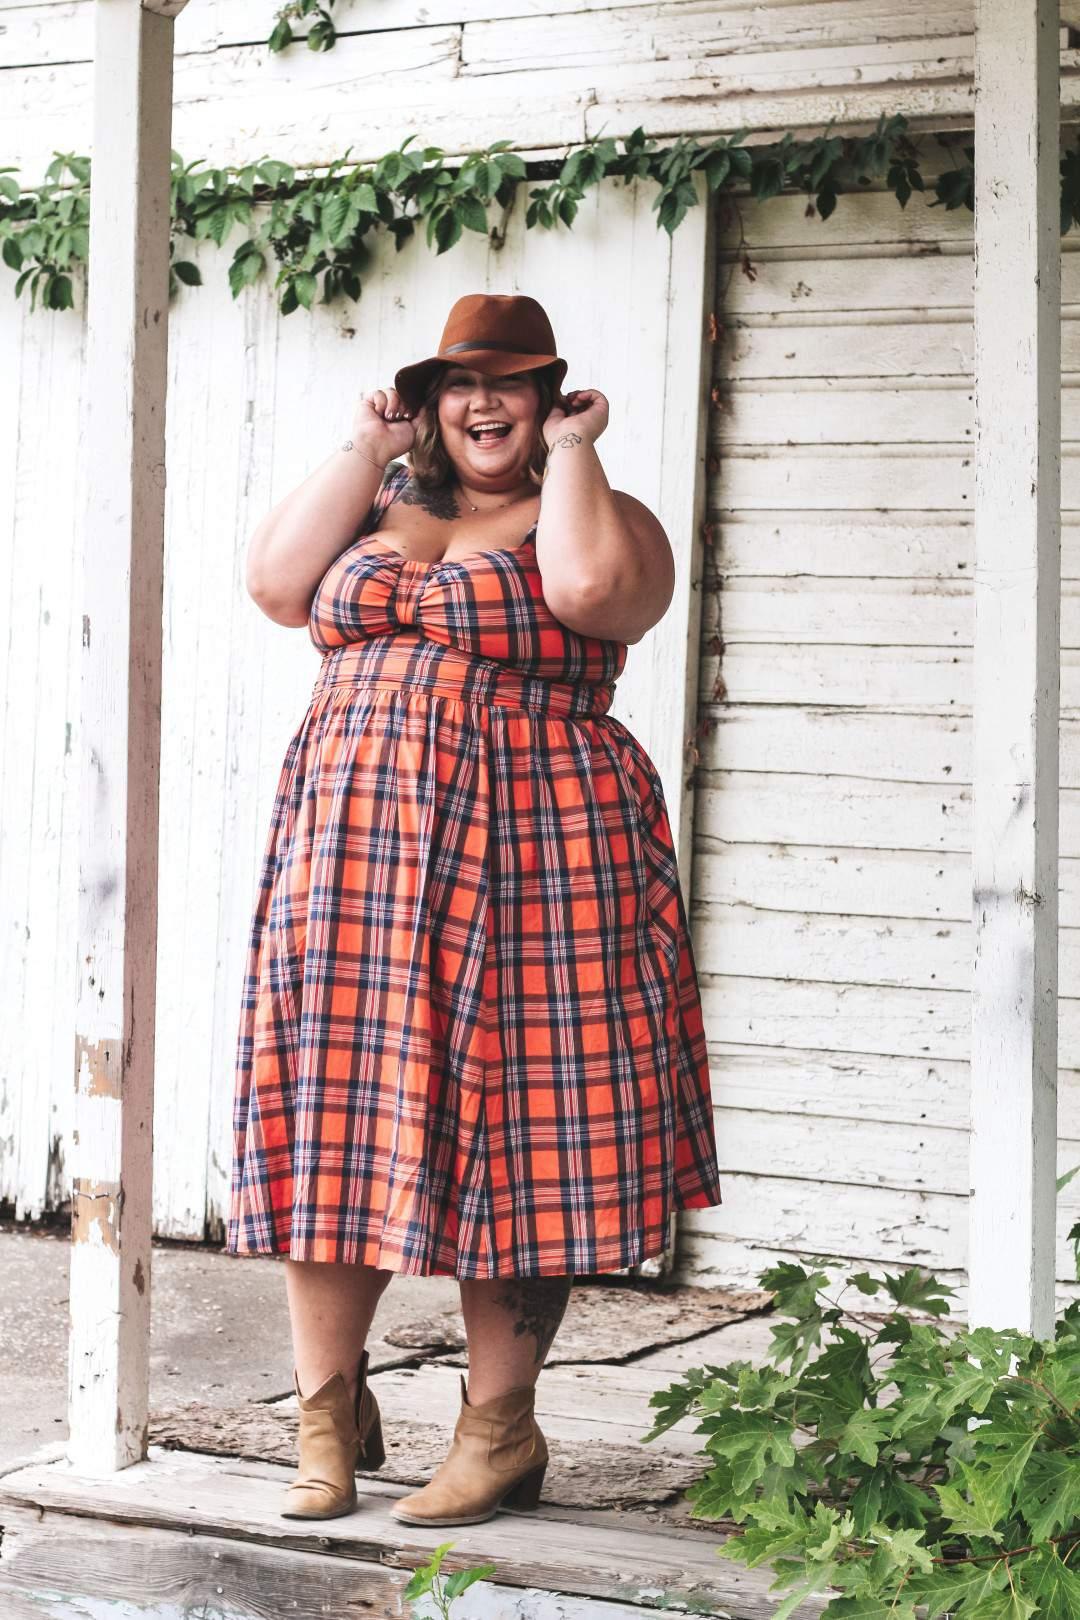 Plus size blogger spotlight on Fat Girl Flow